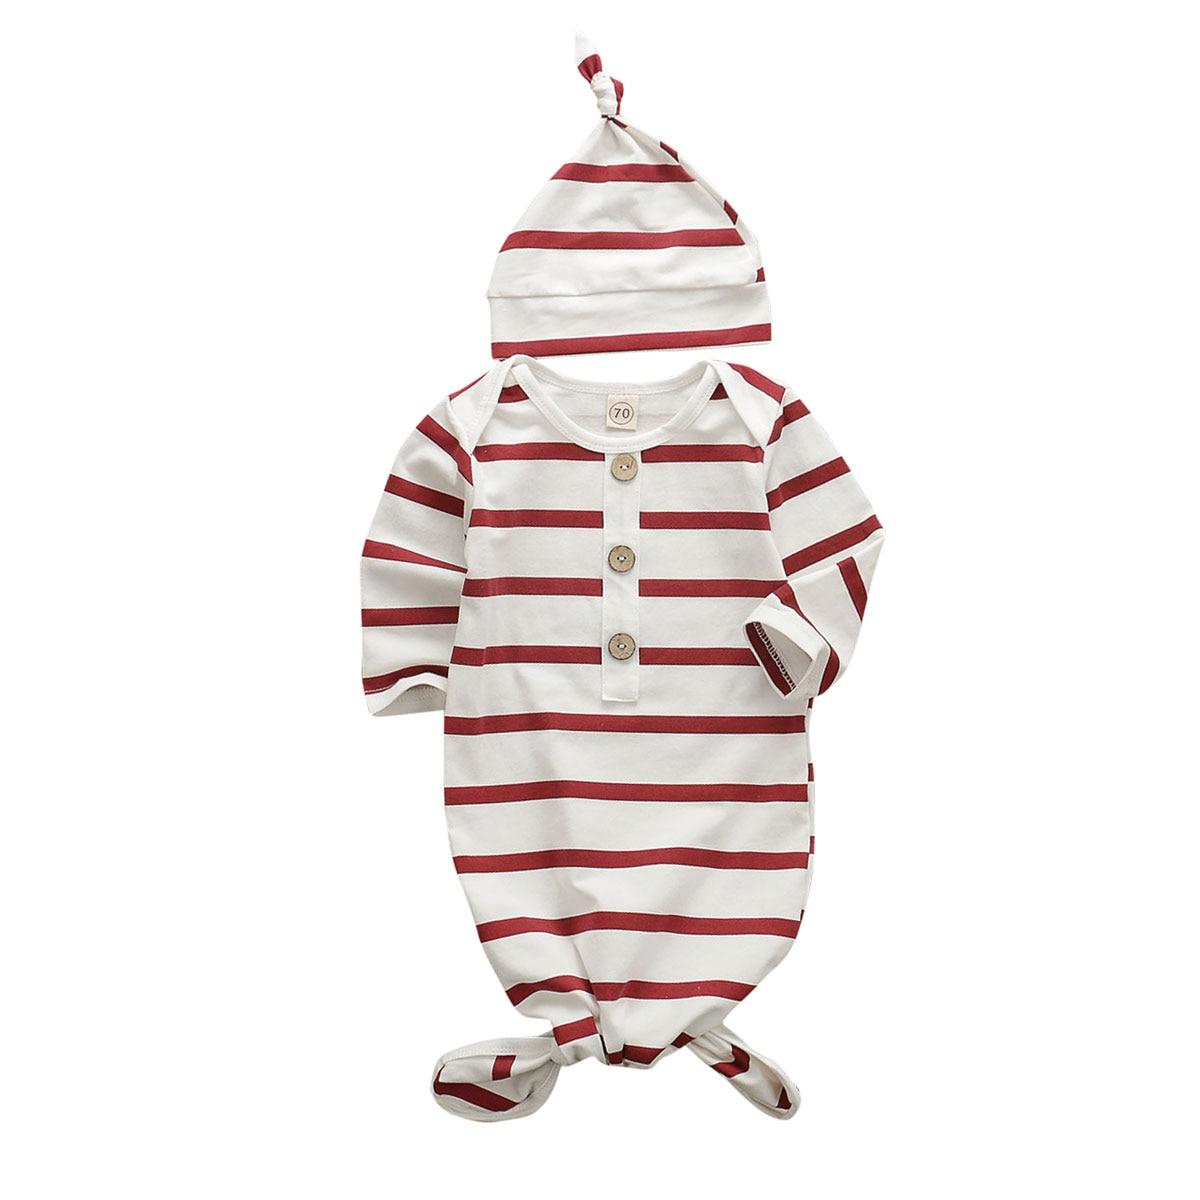 0-6M Infant Newborn Baby Boy Girl Swaddle Wrap Blanket Sleeping Bag  Red White Striped